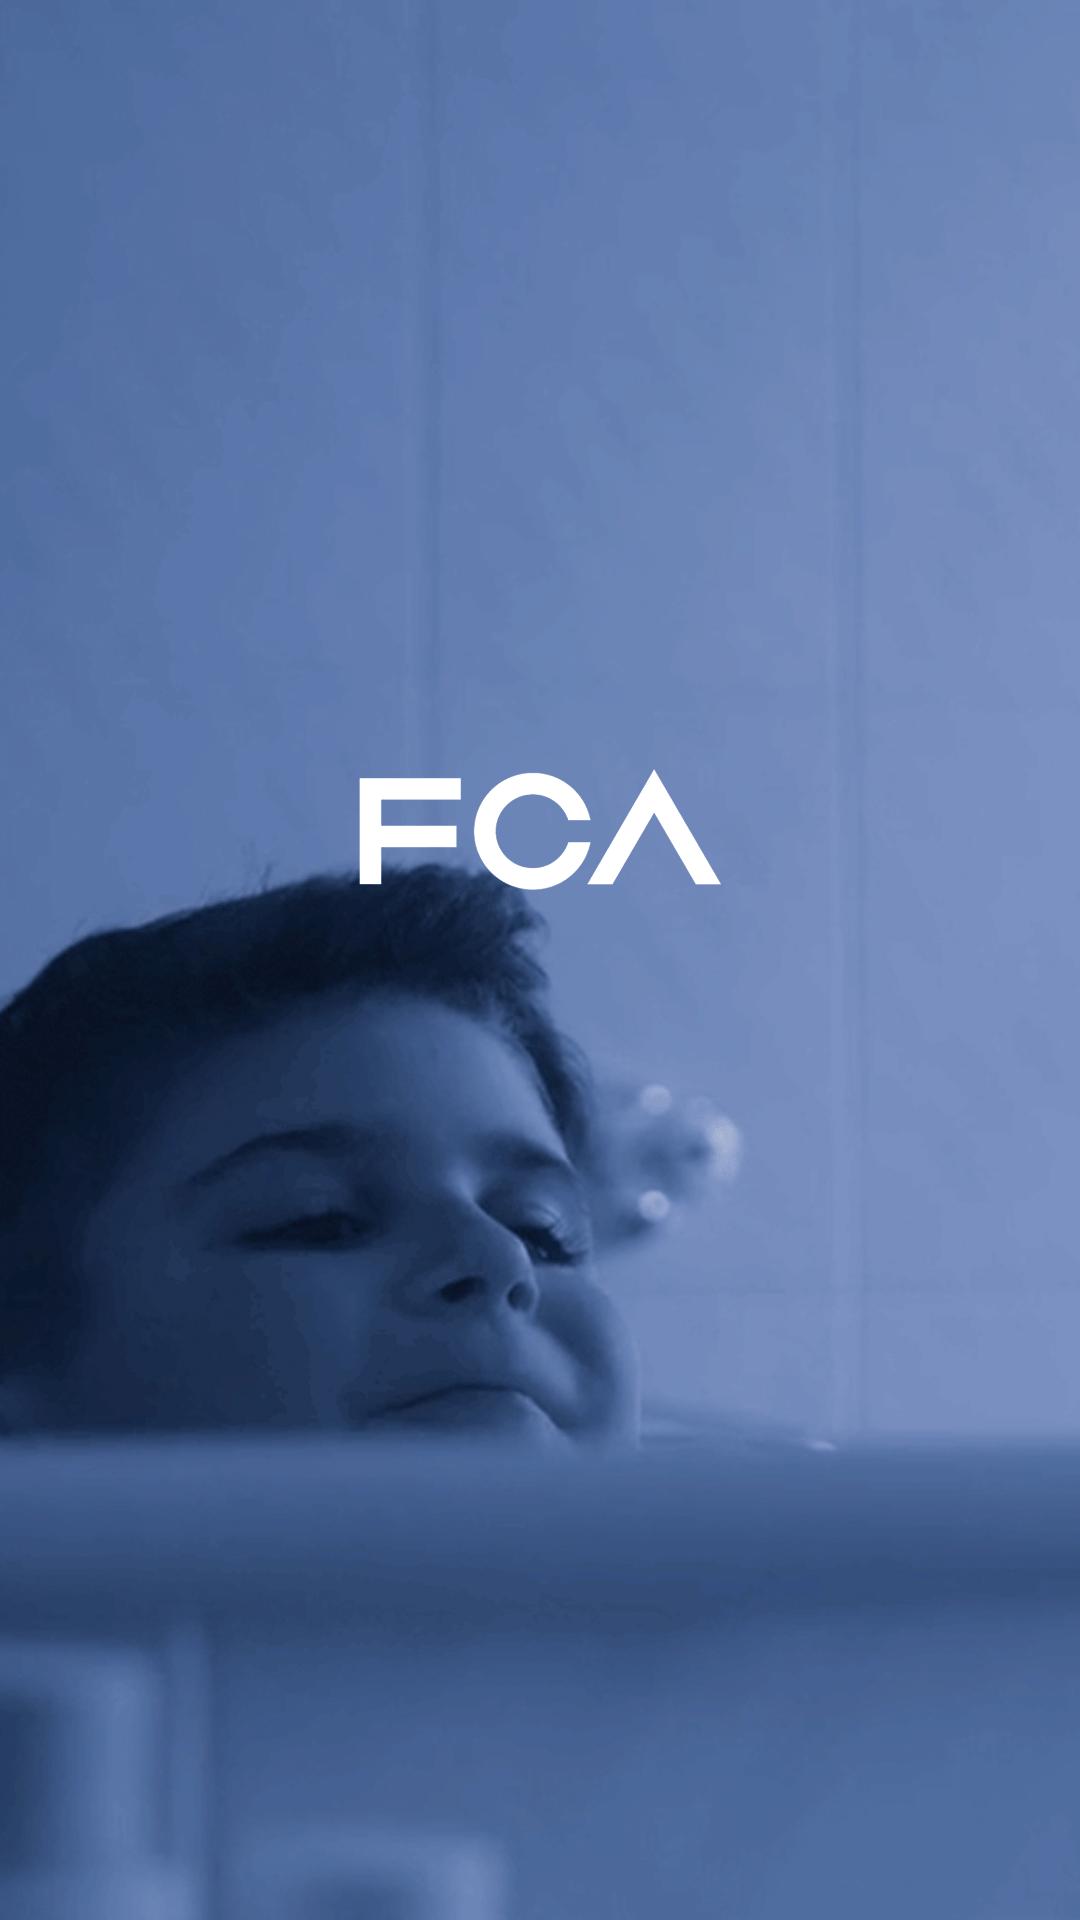 FCA Spot